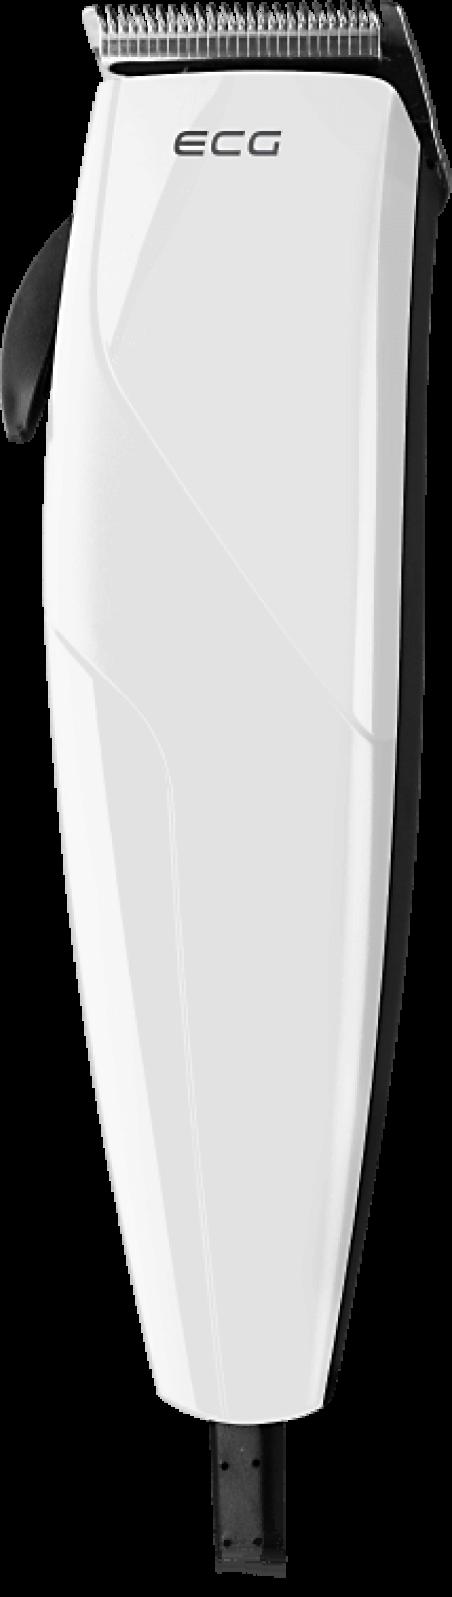 Машинка для стрижки ECG ZS 1020 White